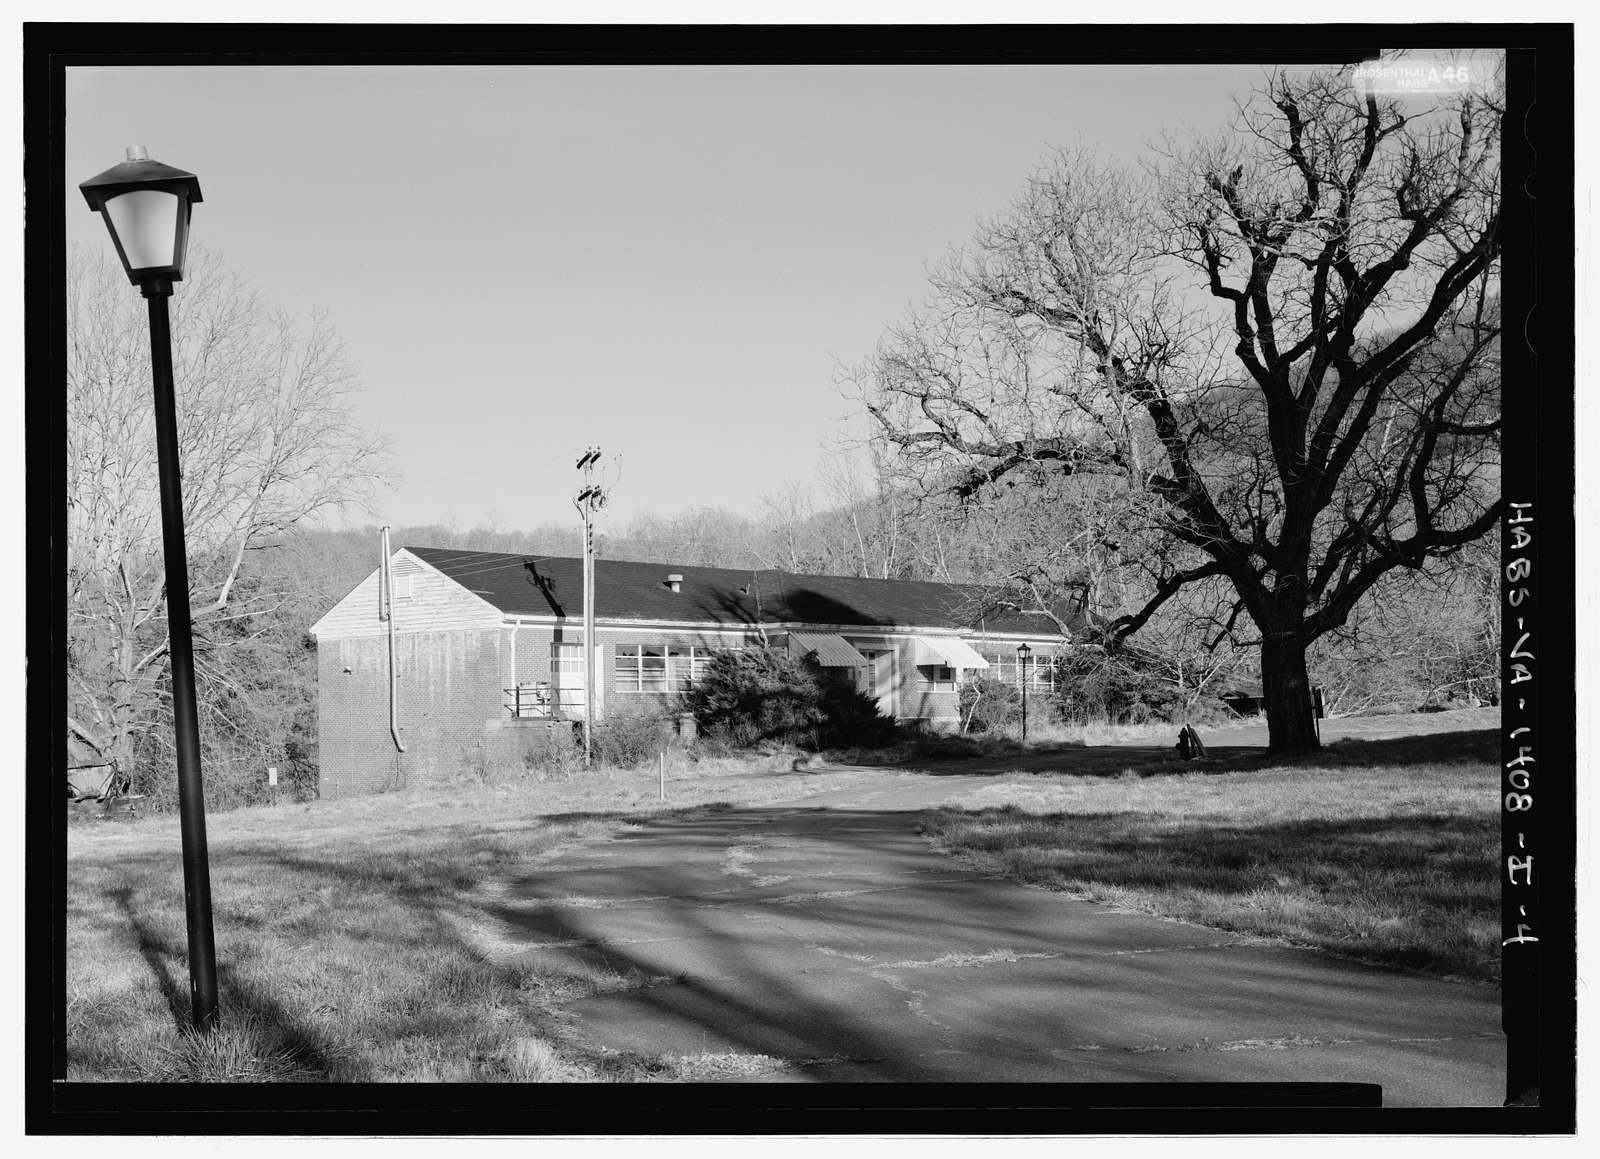 Blue Ridge Sanatorium, Building No. 1908, East side of State Route 20, .25 mile south of I-64, Charlottesville, Charlottesville, VA